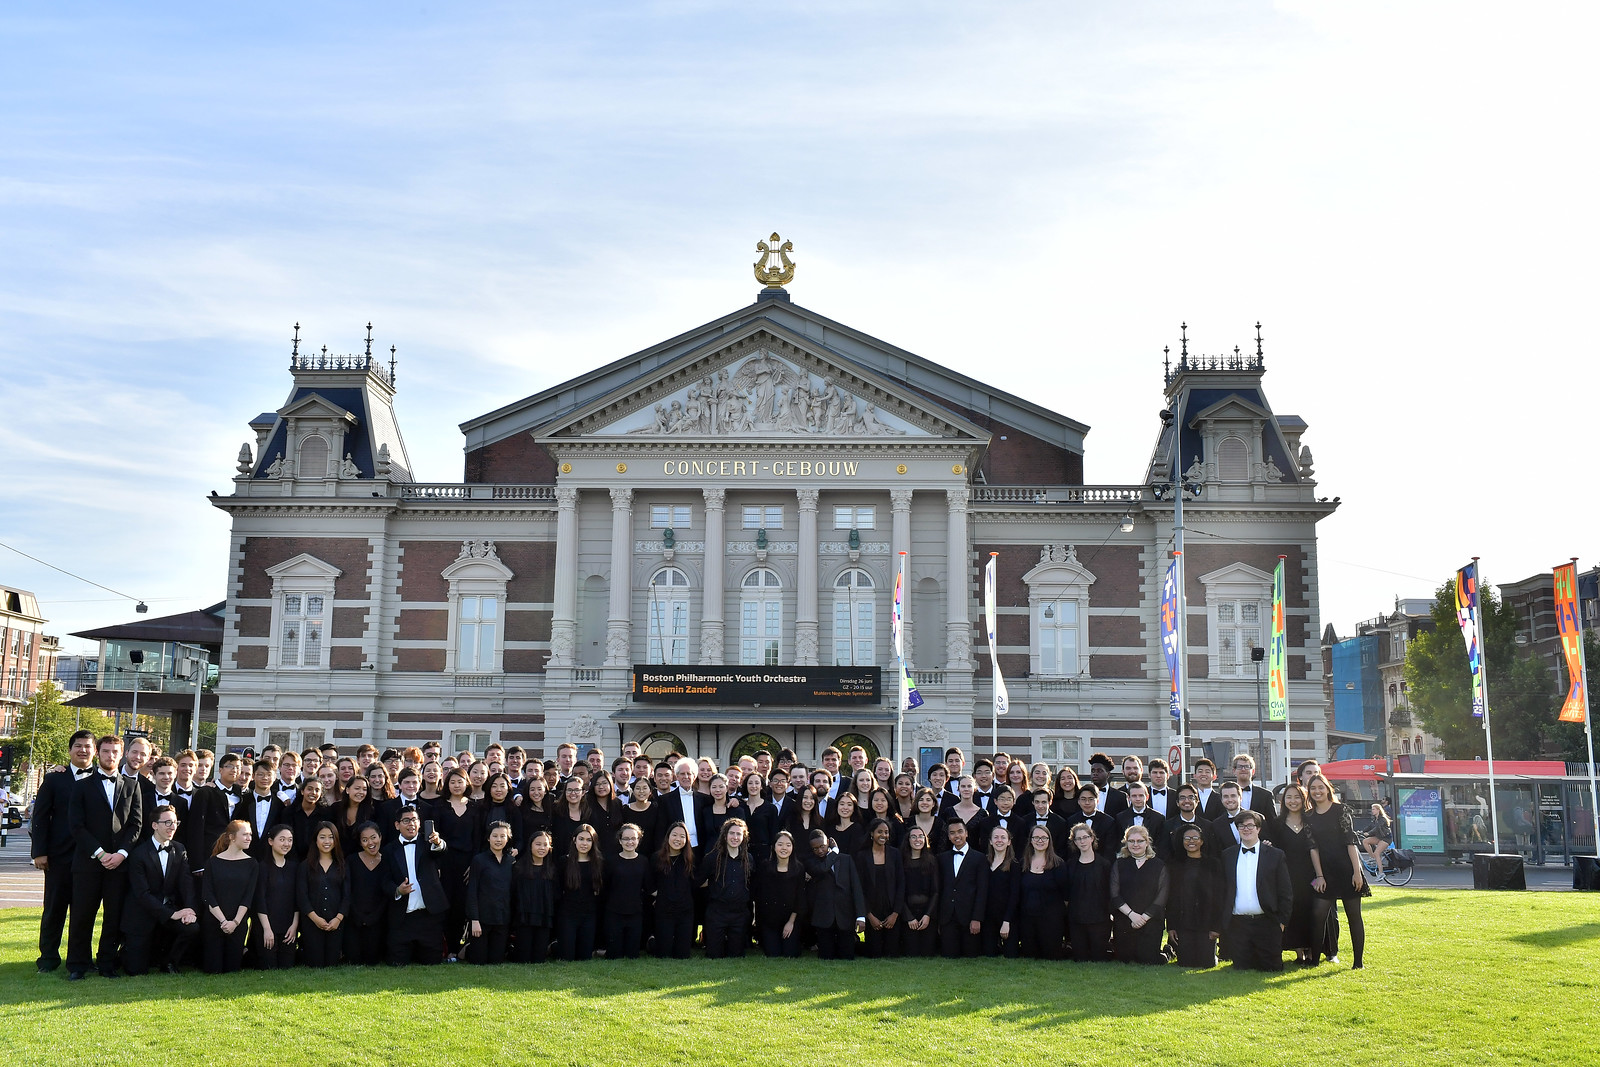 FY18 BPYO Tour - Concertgebouw (credit - Paul Marotta)